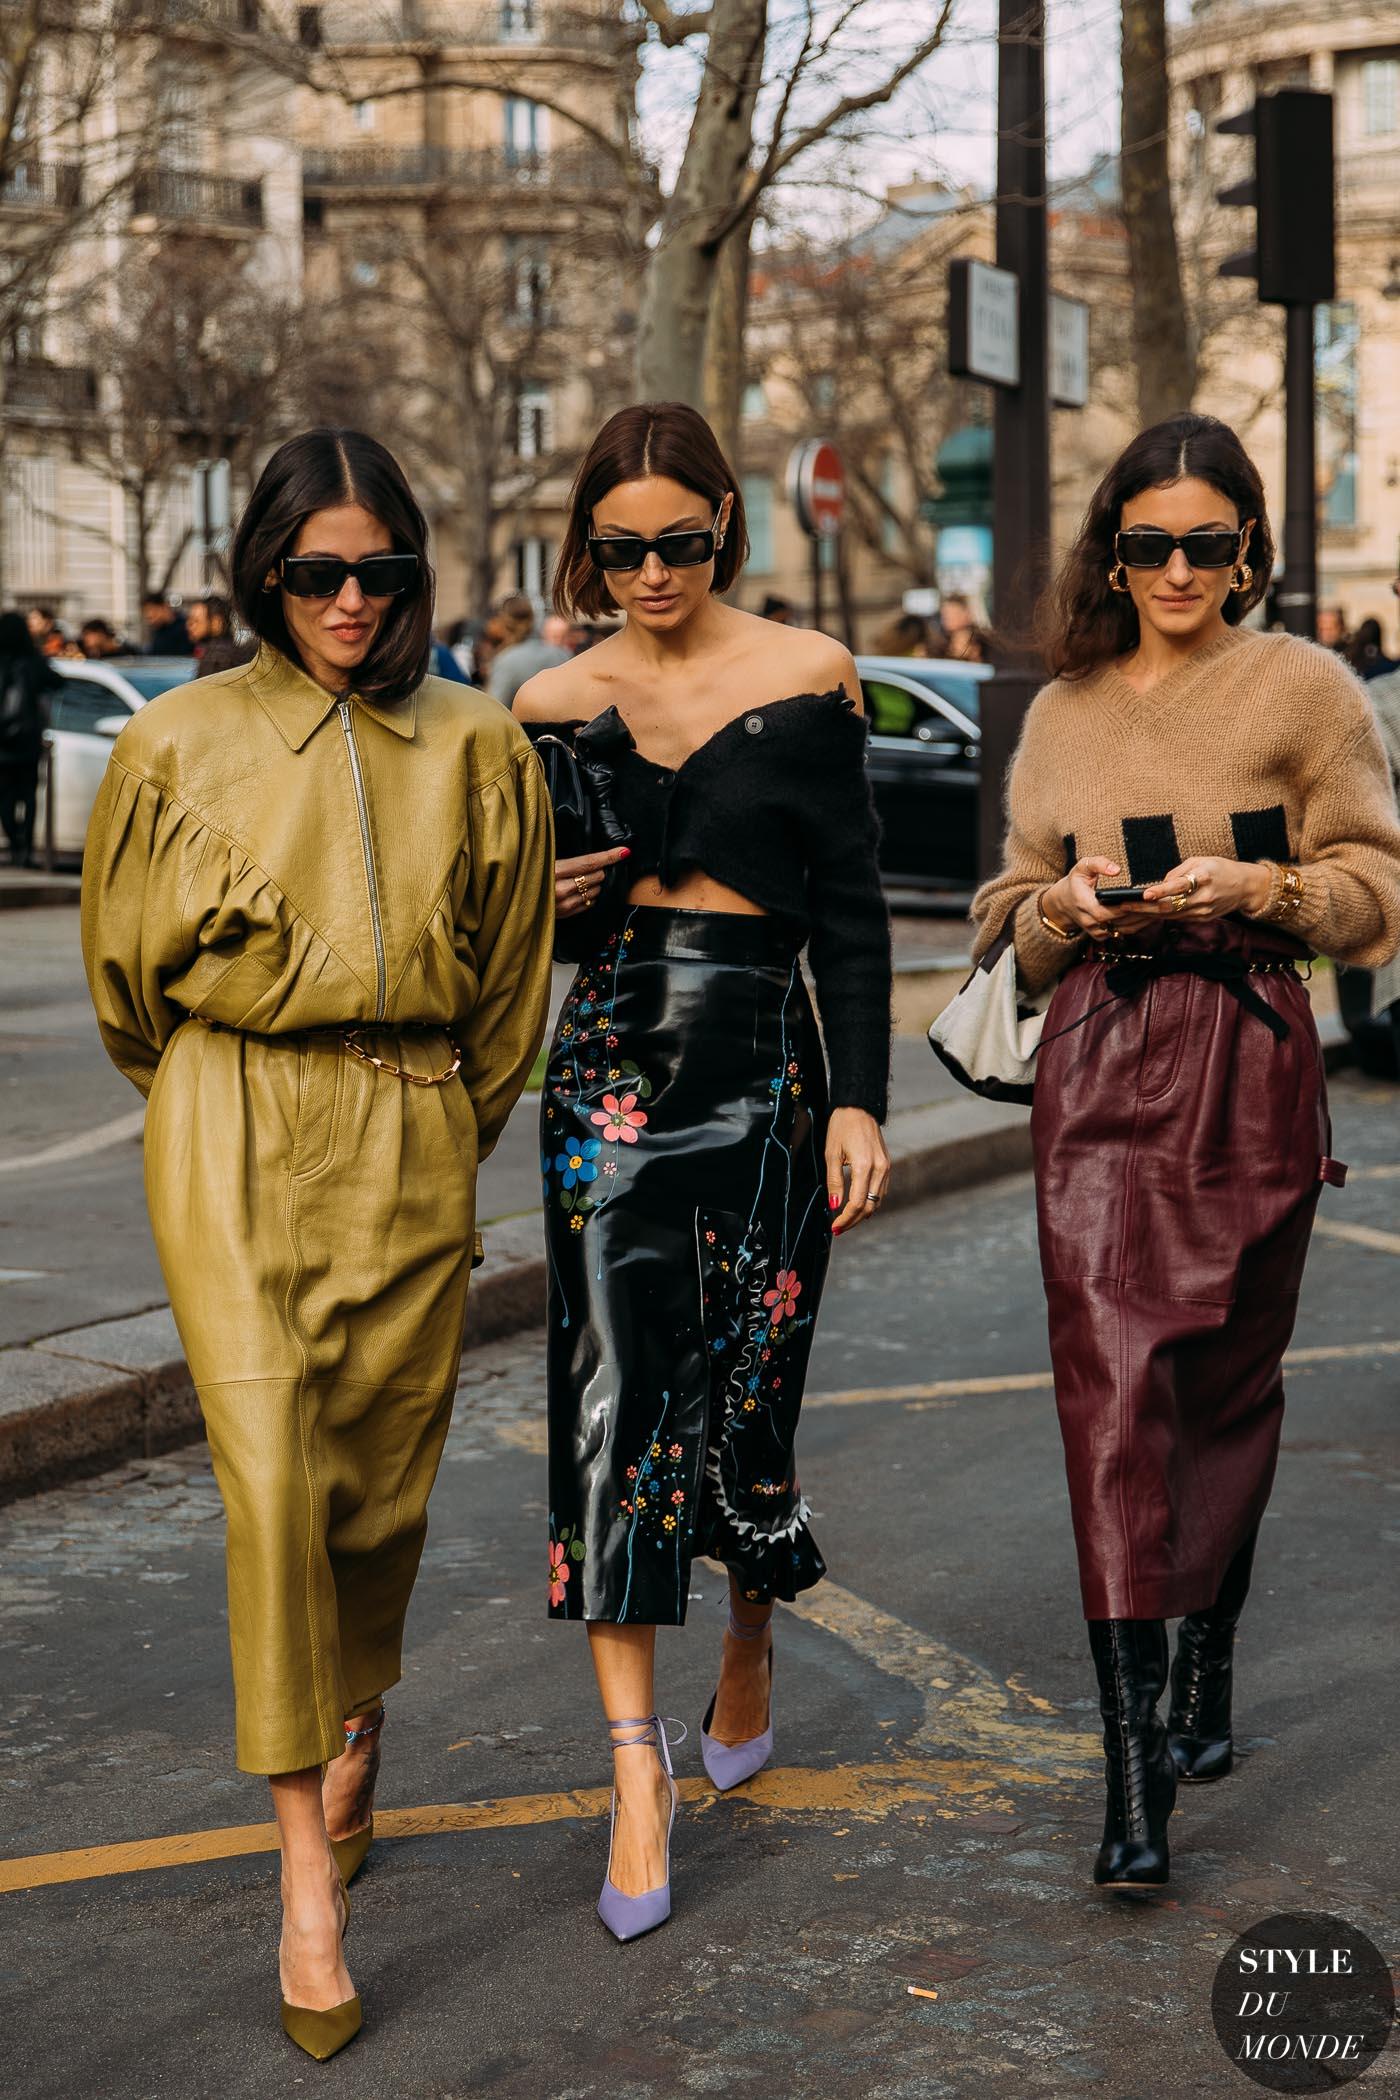 Milan Fall 2020 Street Style: Gilda Ambrosio - STYLE DU